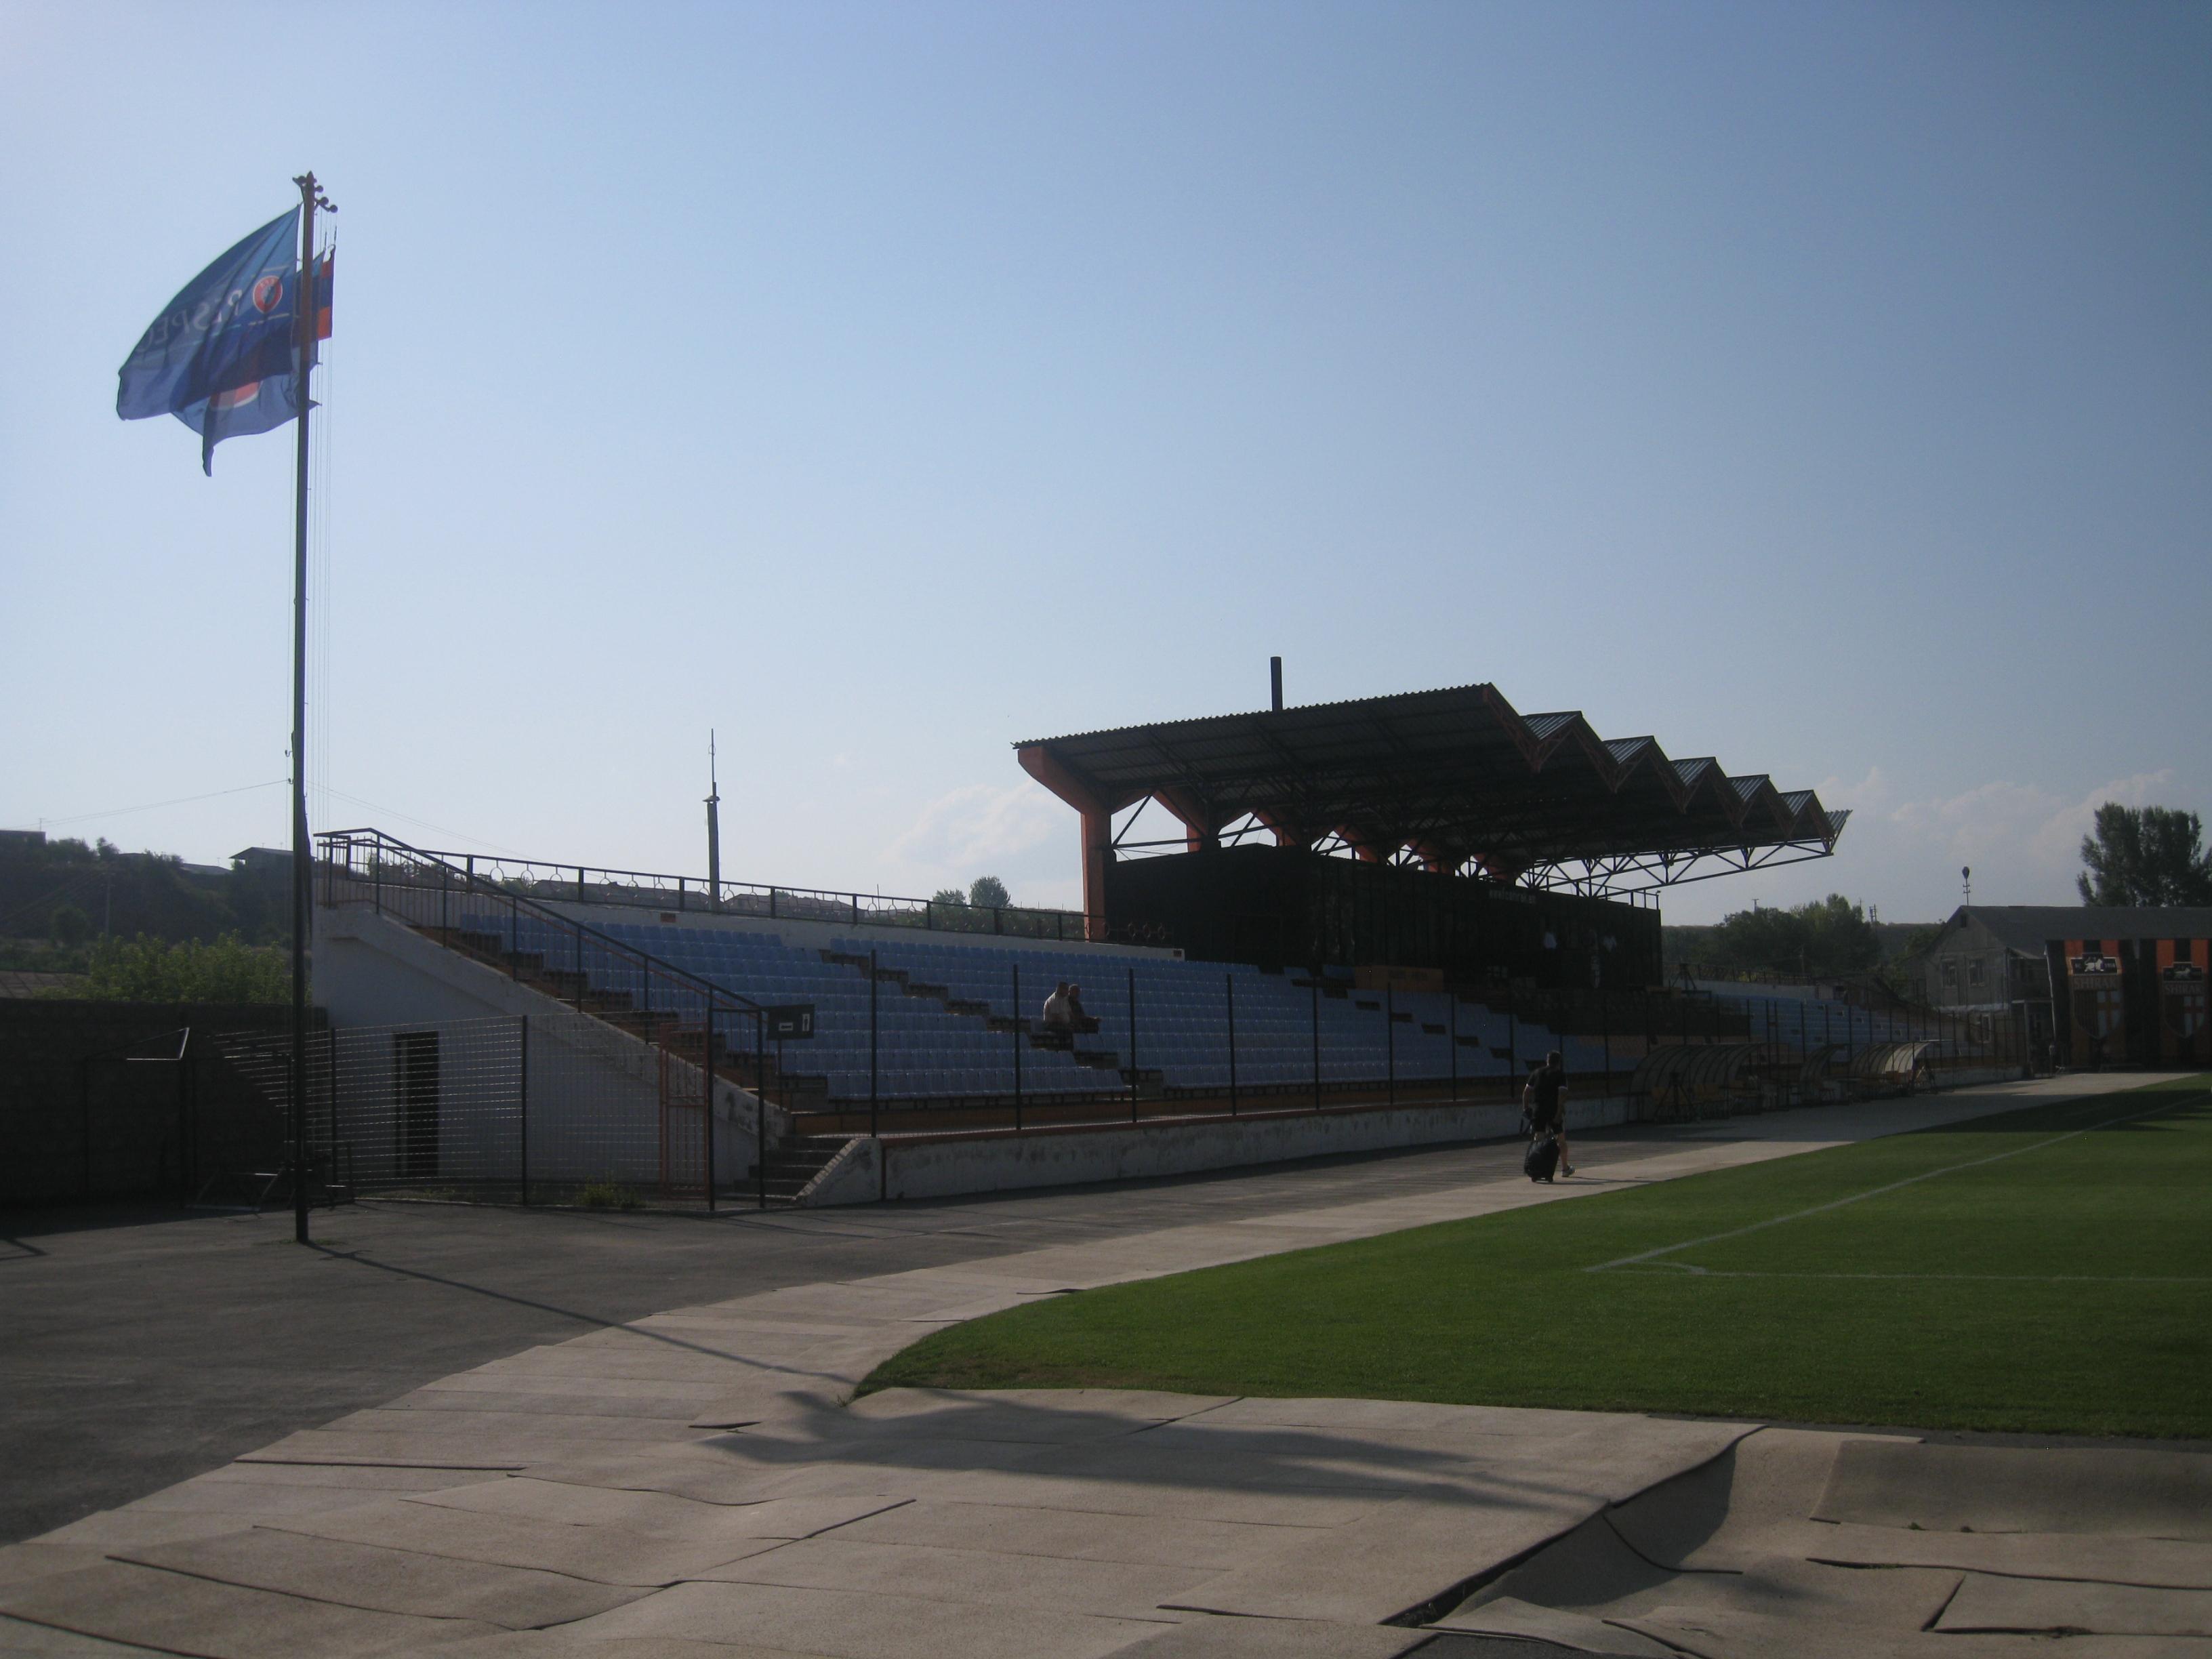 Stadion lokalnog kluba Širak - Photo: Vladimir Šoškić